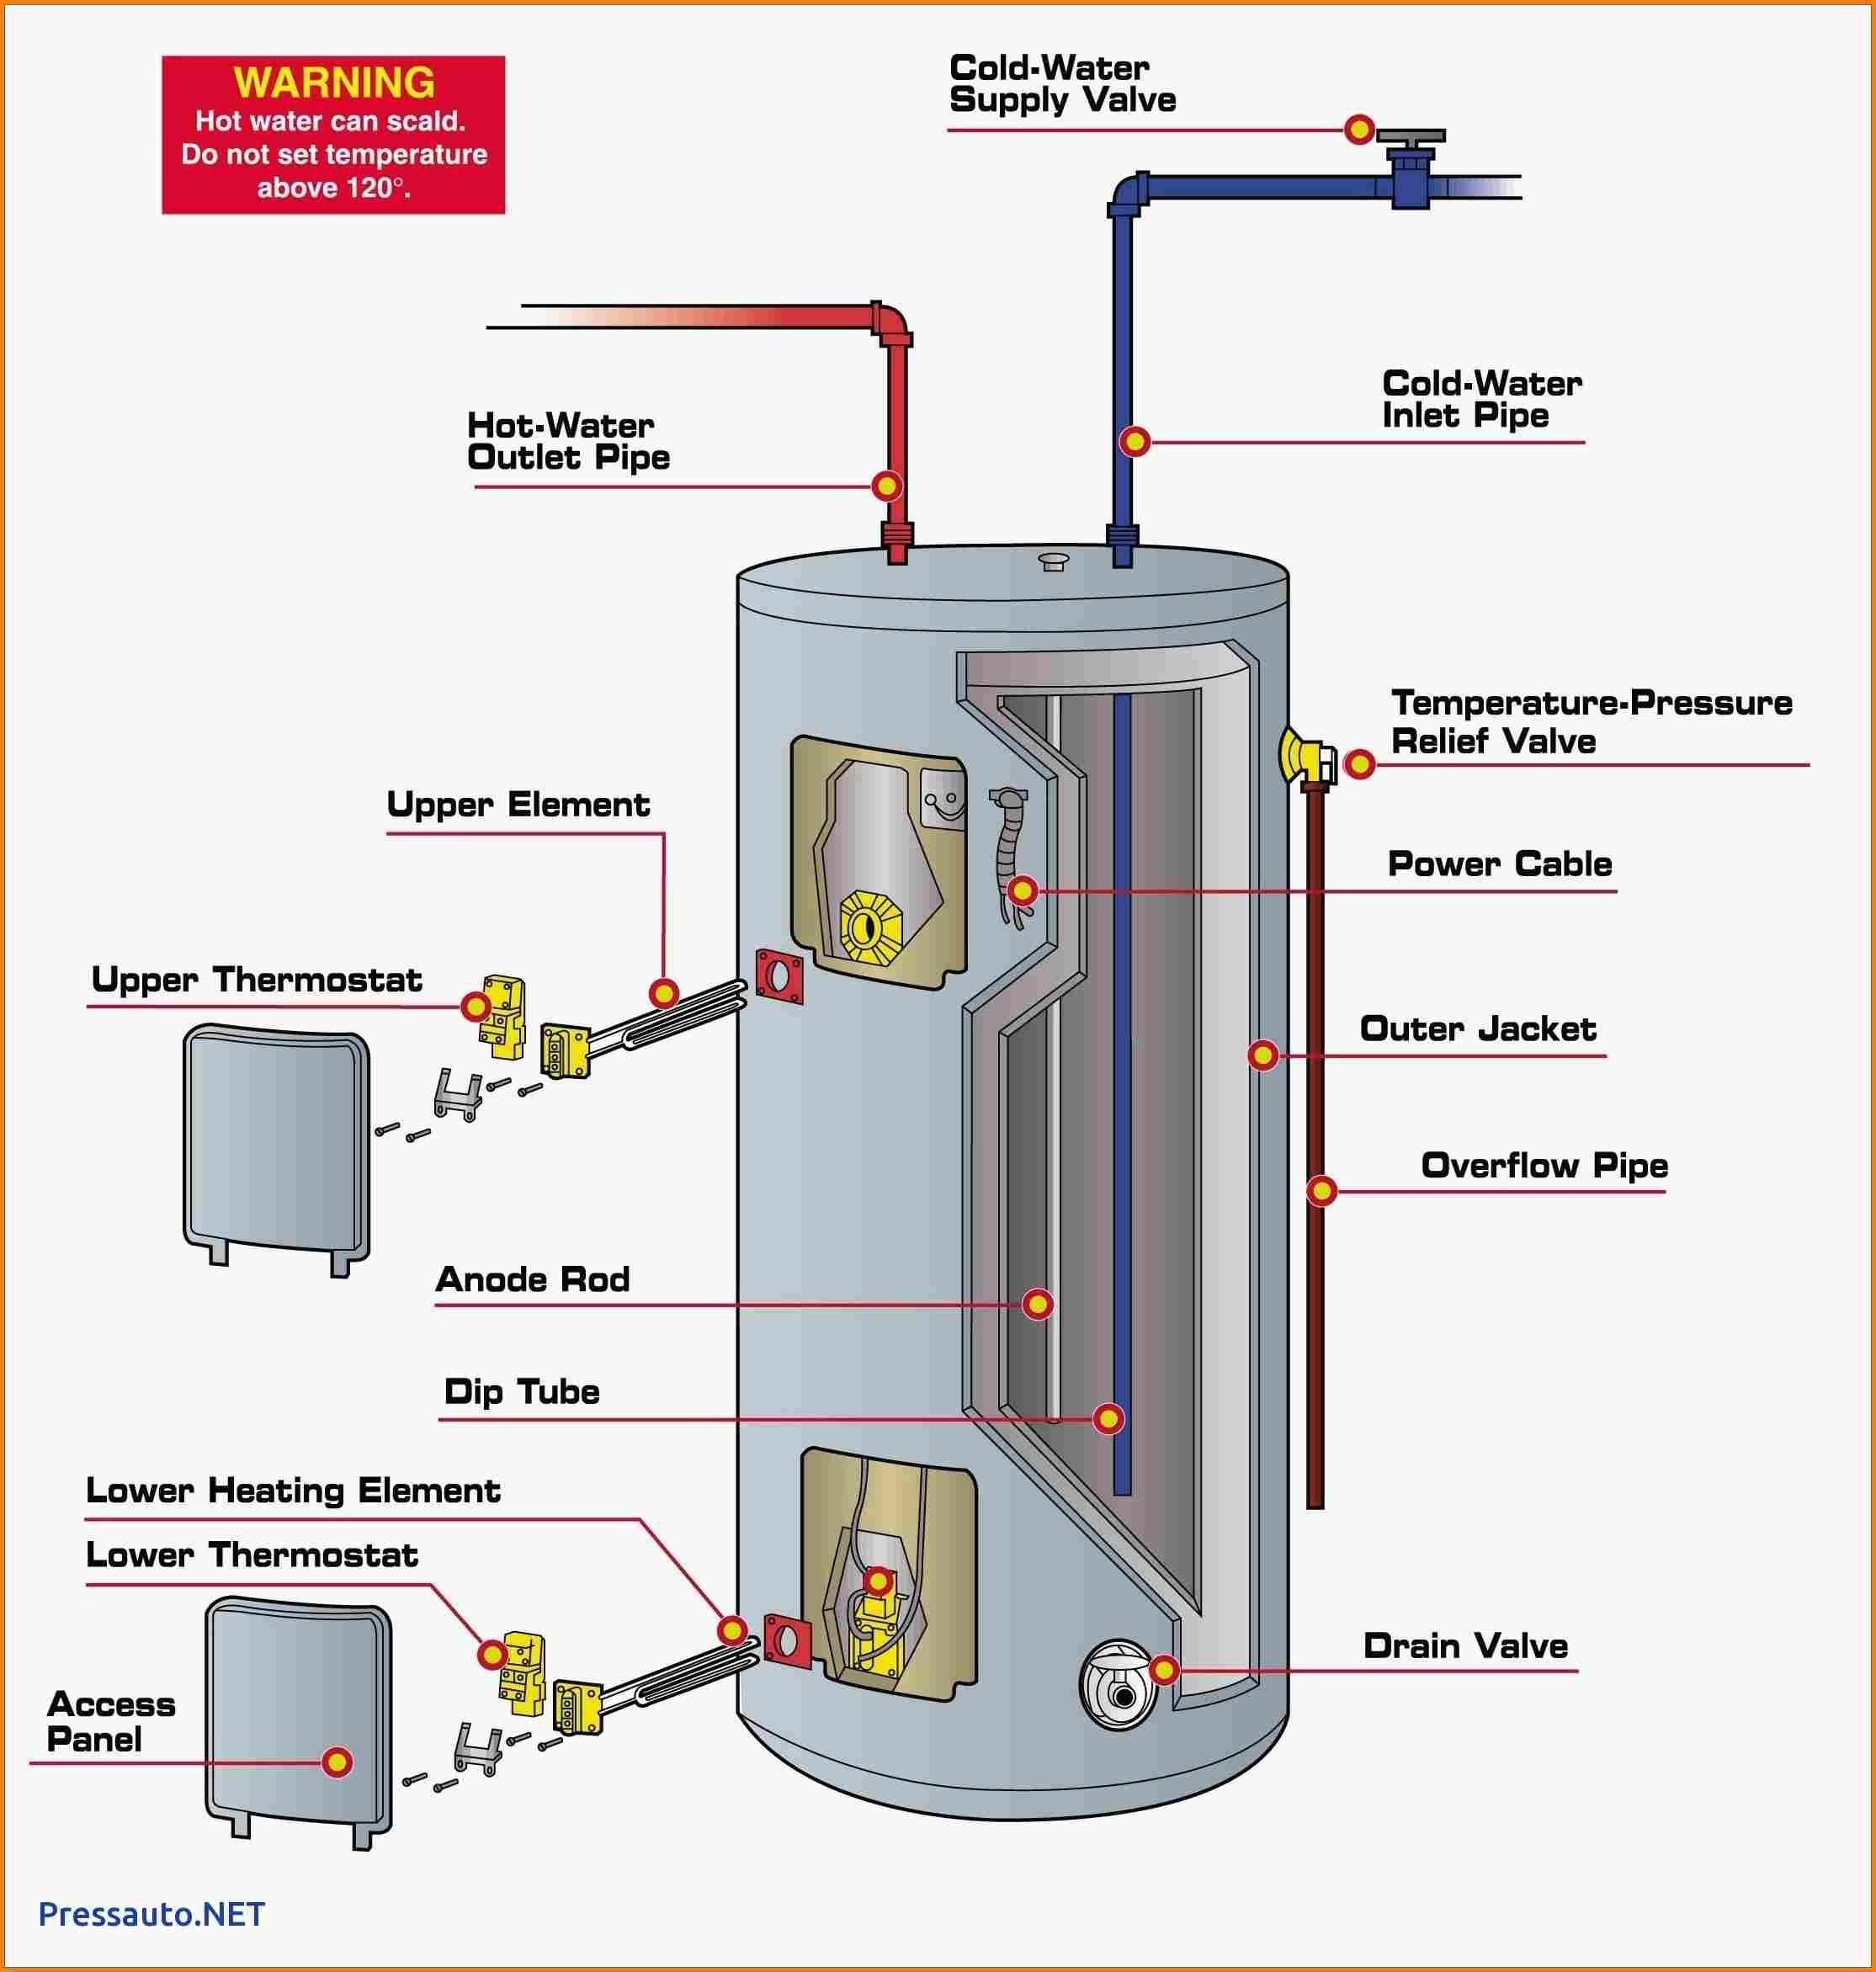 Immersion Heater Wiring Diagram Wiring Diagram Electric Hot Water Heater Best Water Heater Wiring Of Immersion Heater Wiring Diagram